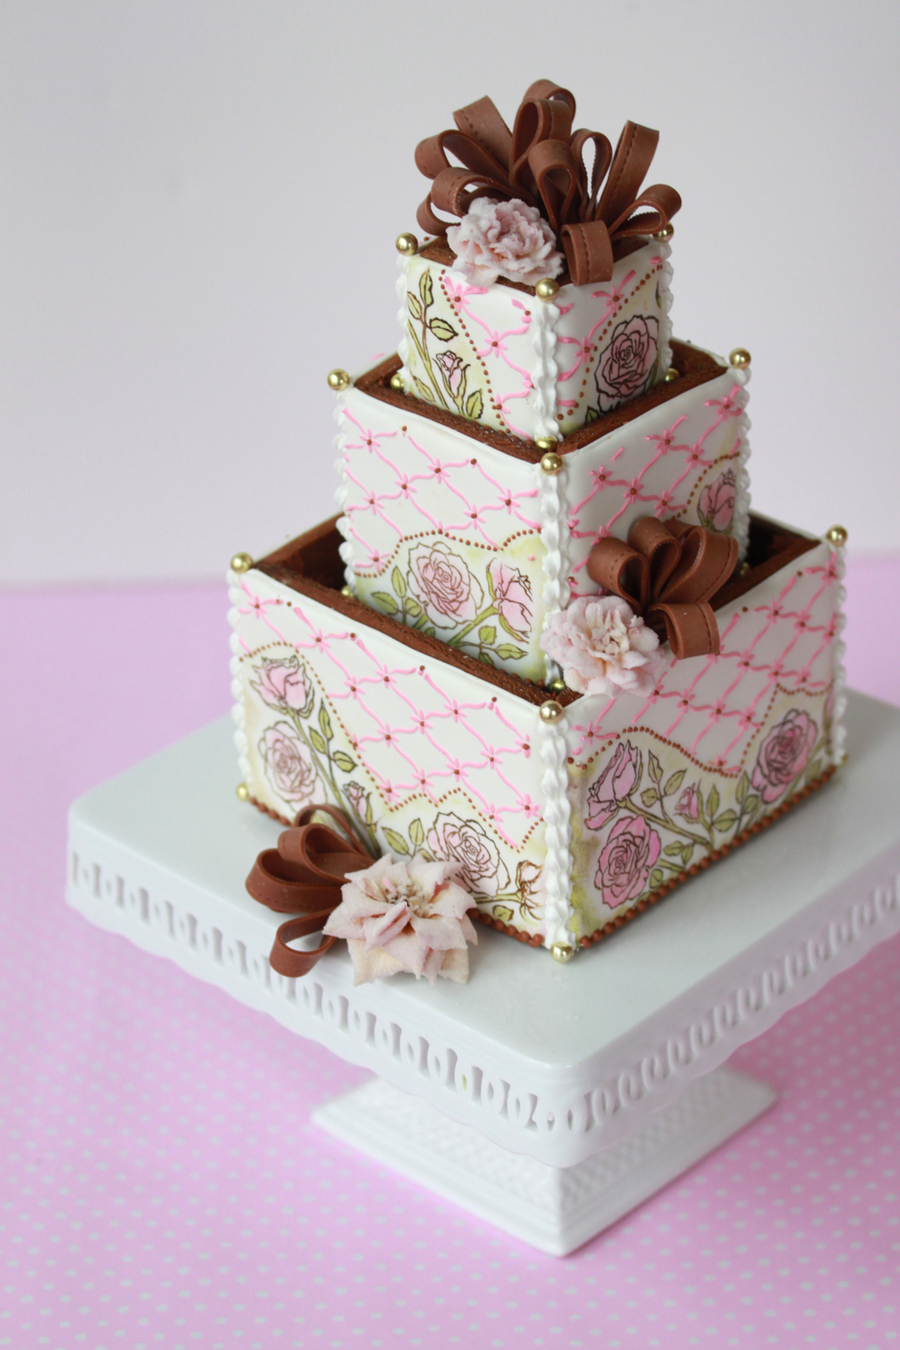 Cake Decorating Classes Europe